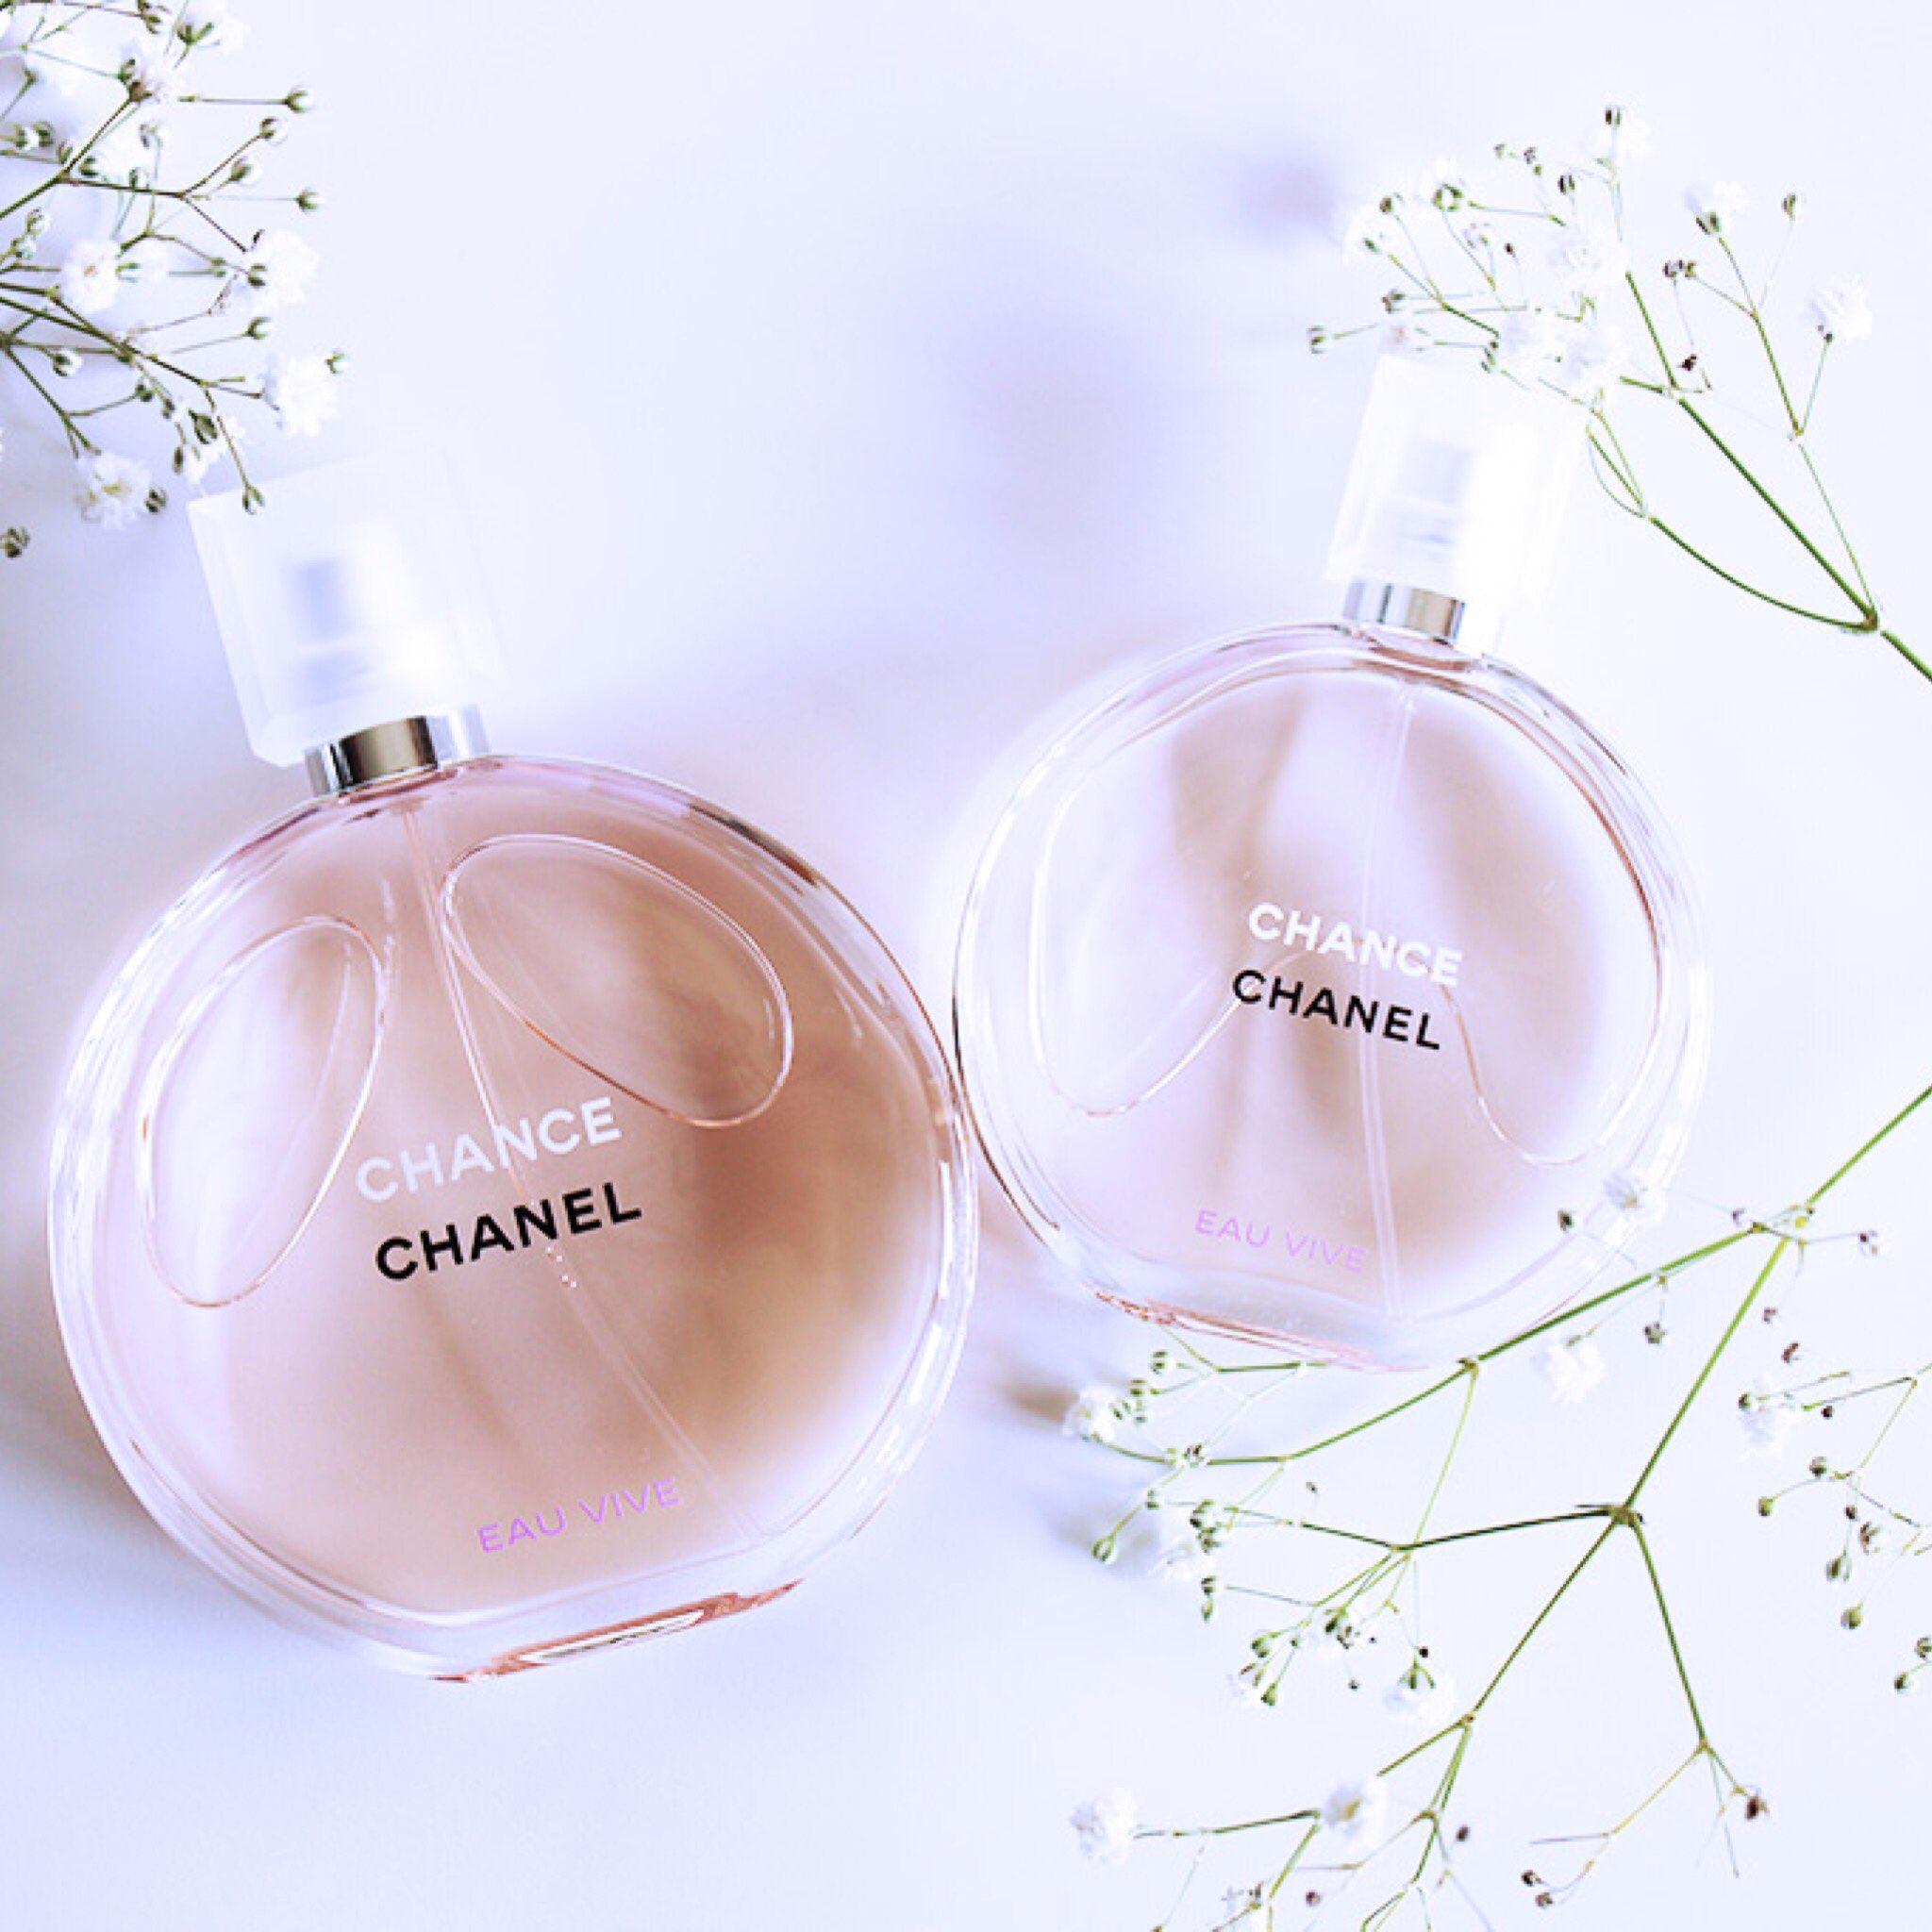 e2cfec826 رائحة عطر شانص شانيل Chance Eau Tendre Chanel   ✨ بروفانس ✨